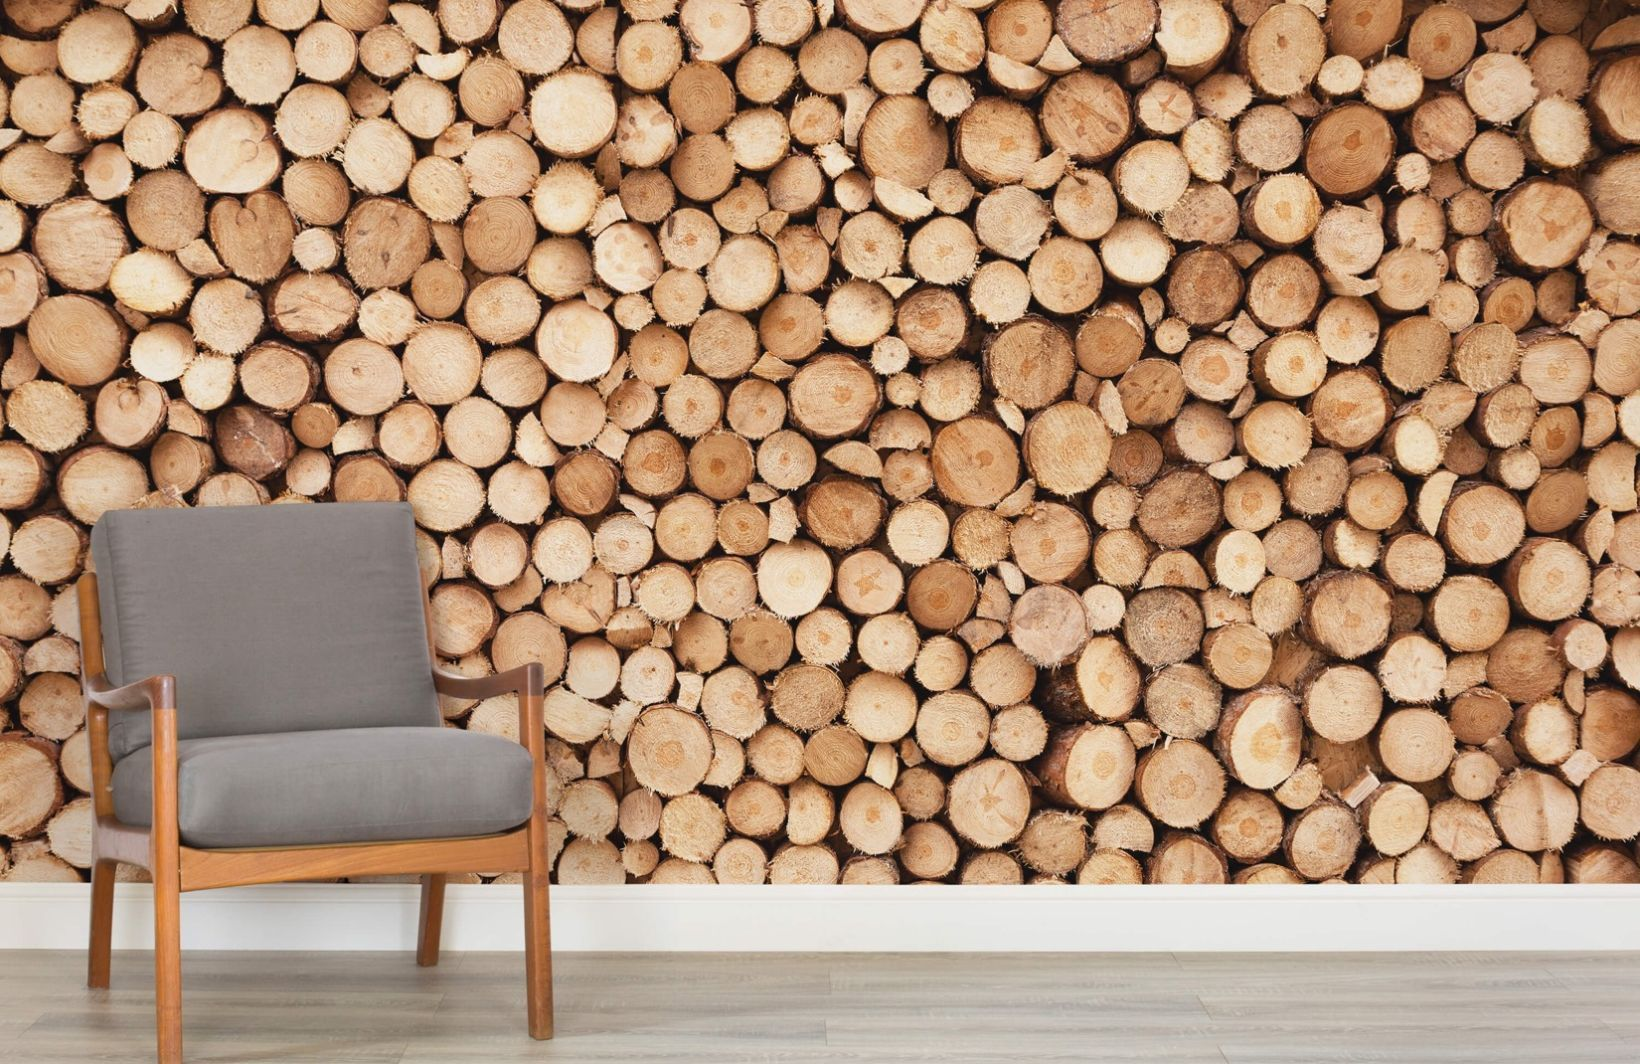 Logs Wallpaper Norweigan Wood Design Muralswallpaper Log Wallpaper Mural Wallpaper Wood Wallpaper